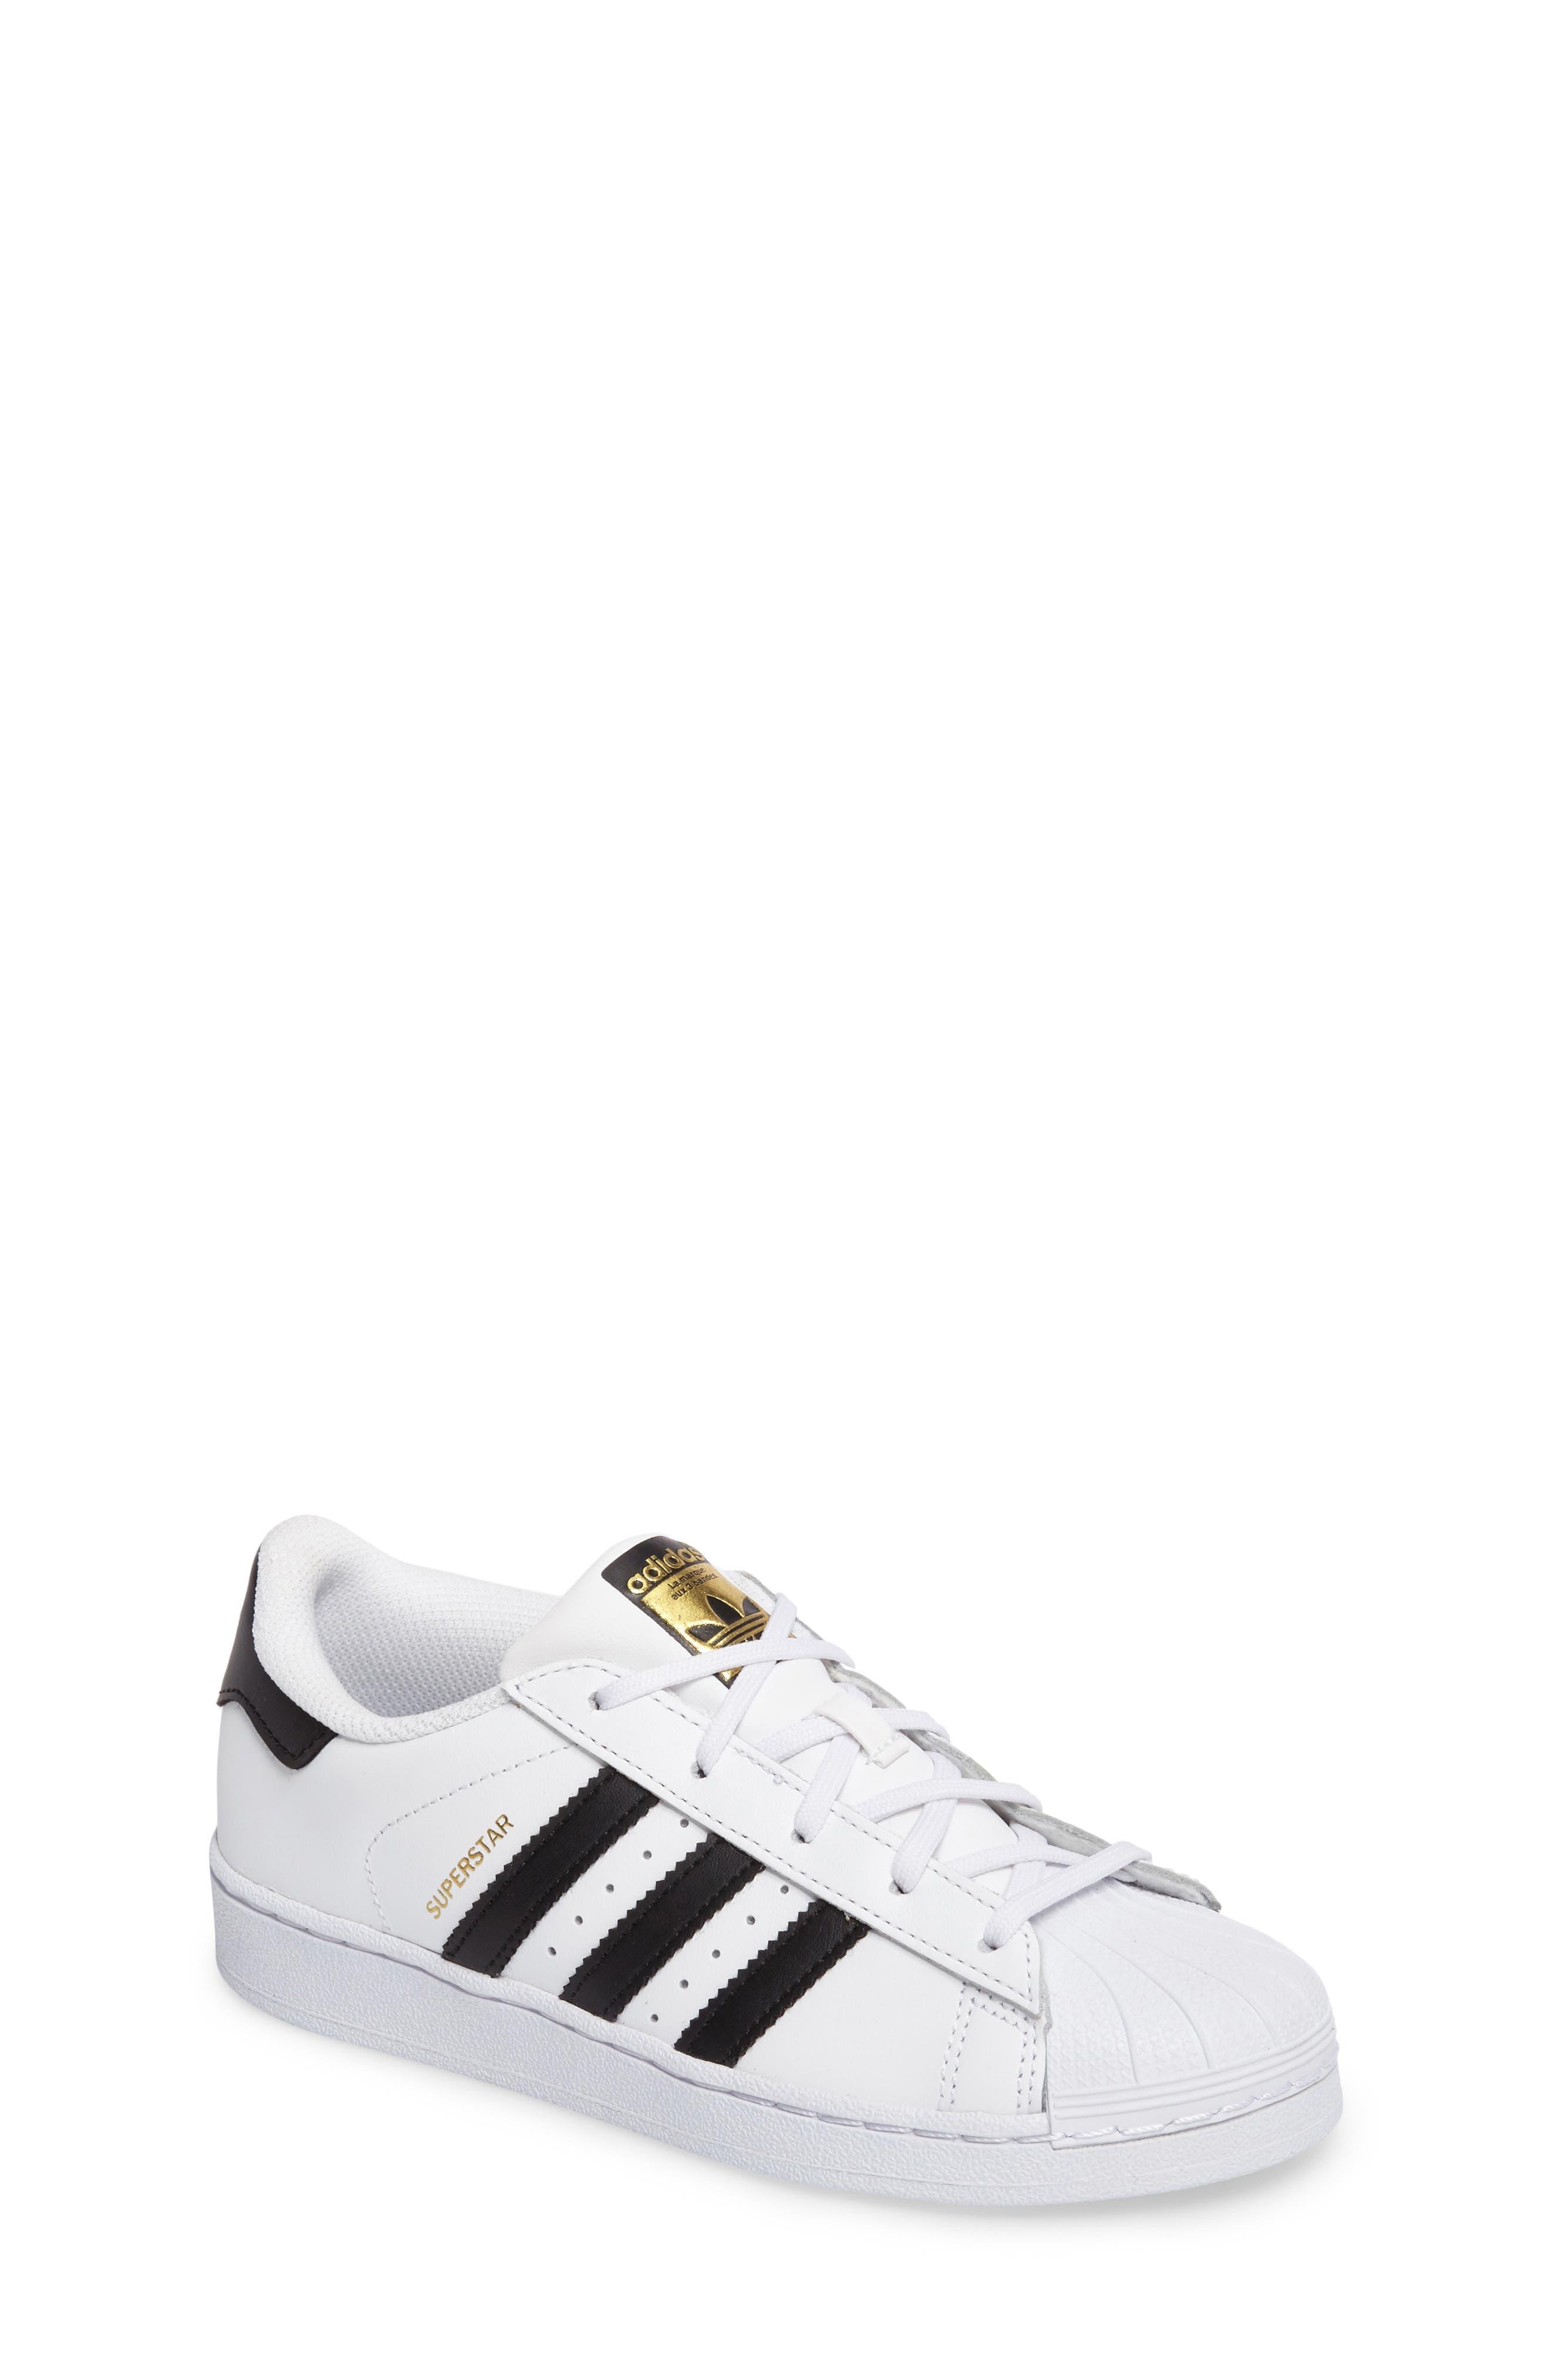 'Superstar Foundation' Sneaker,                         Main,                         color, 100